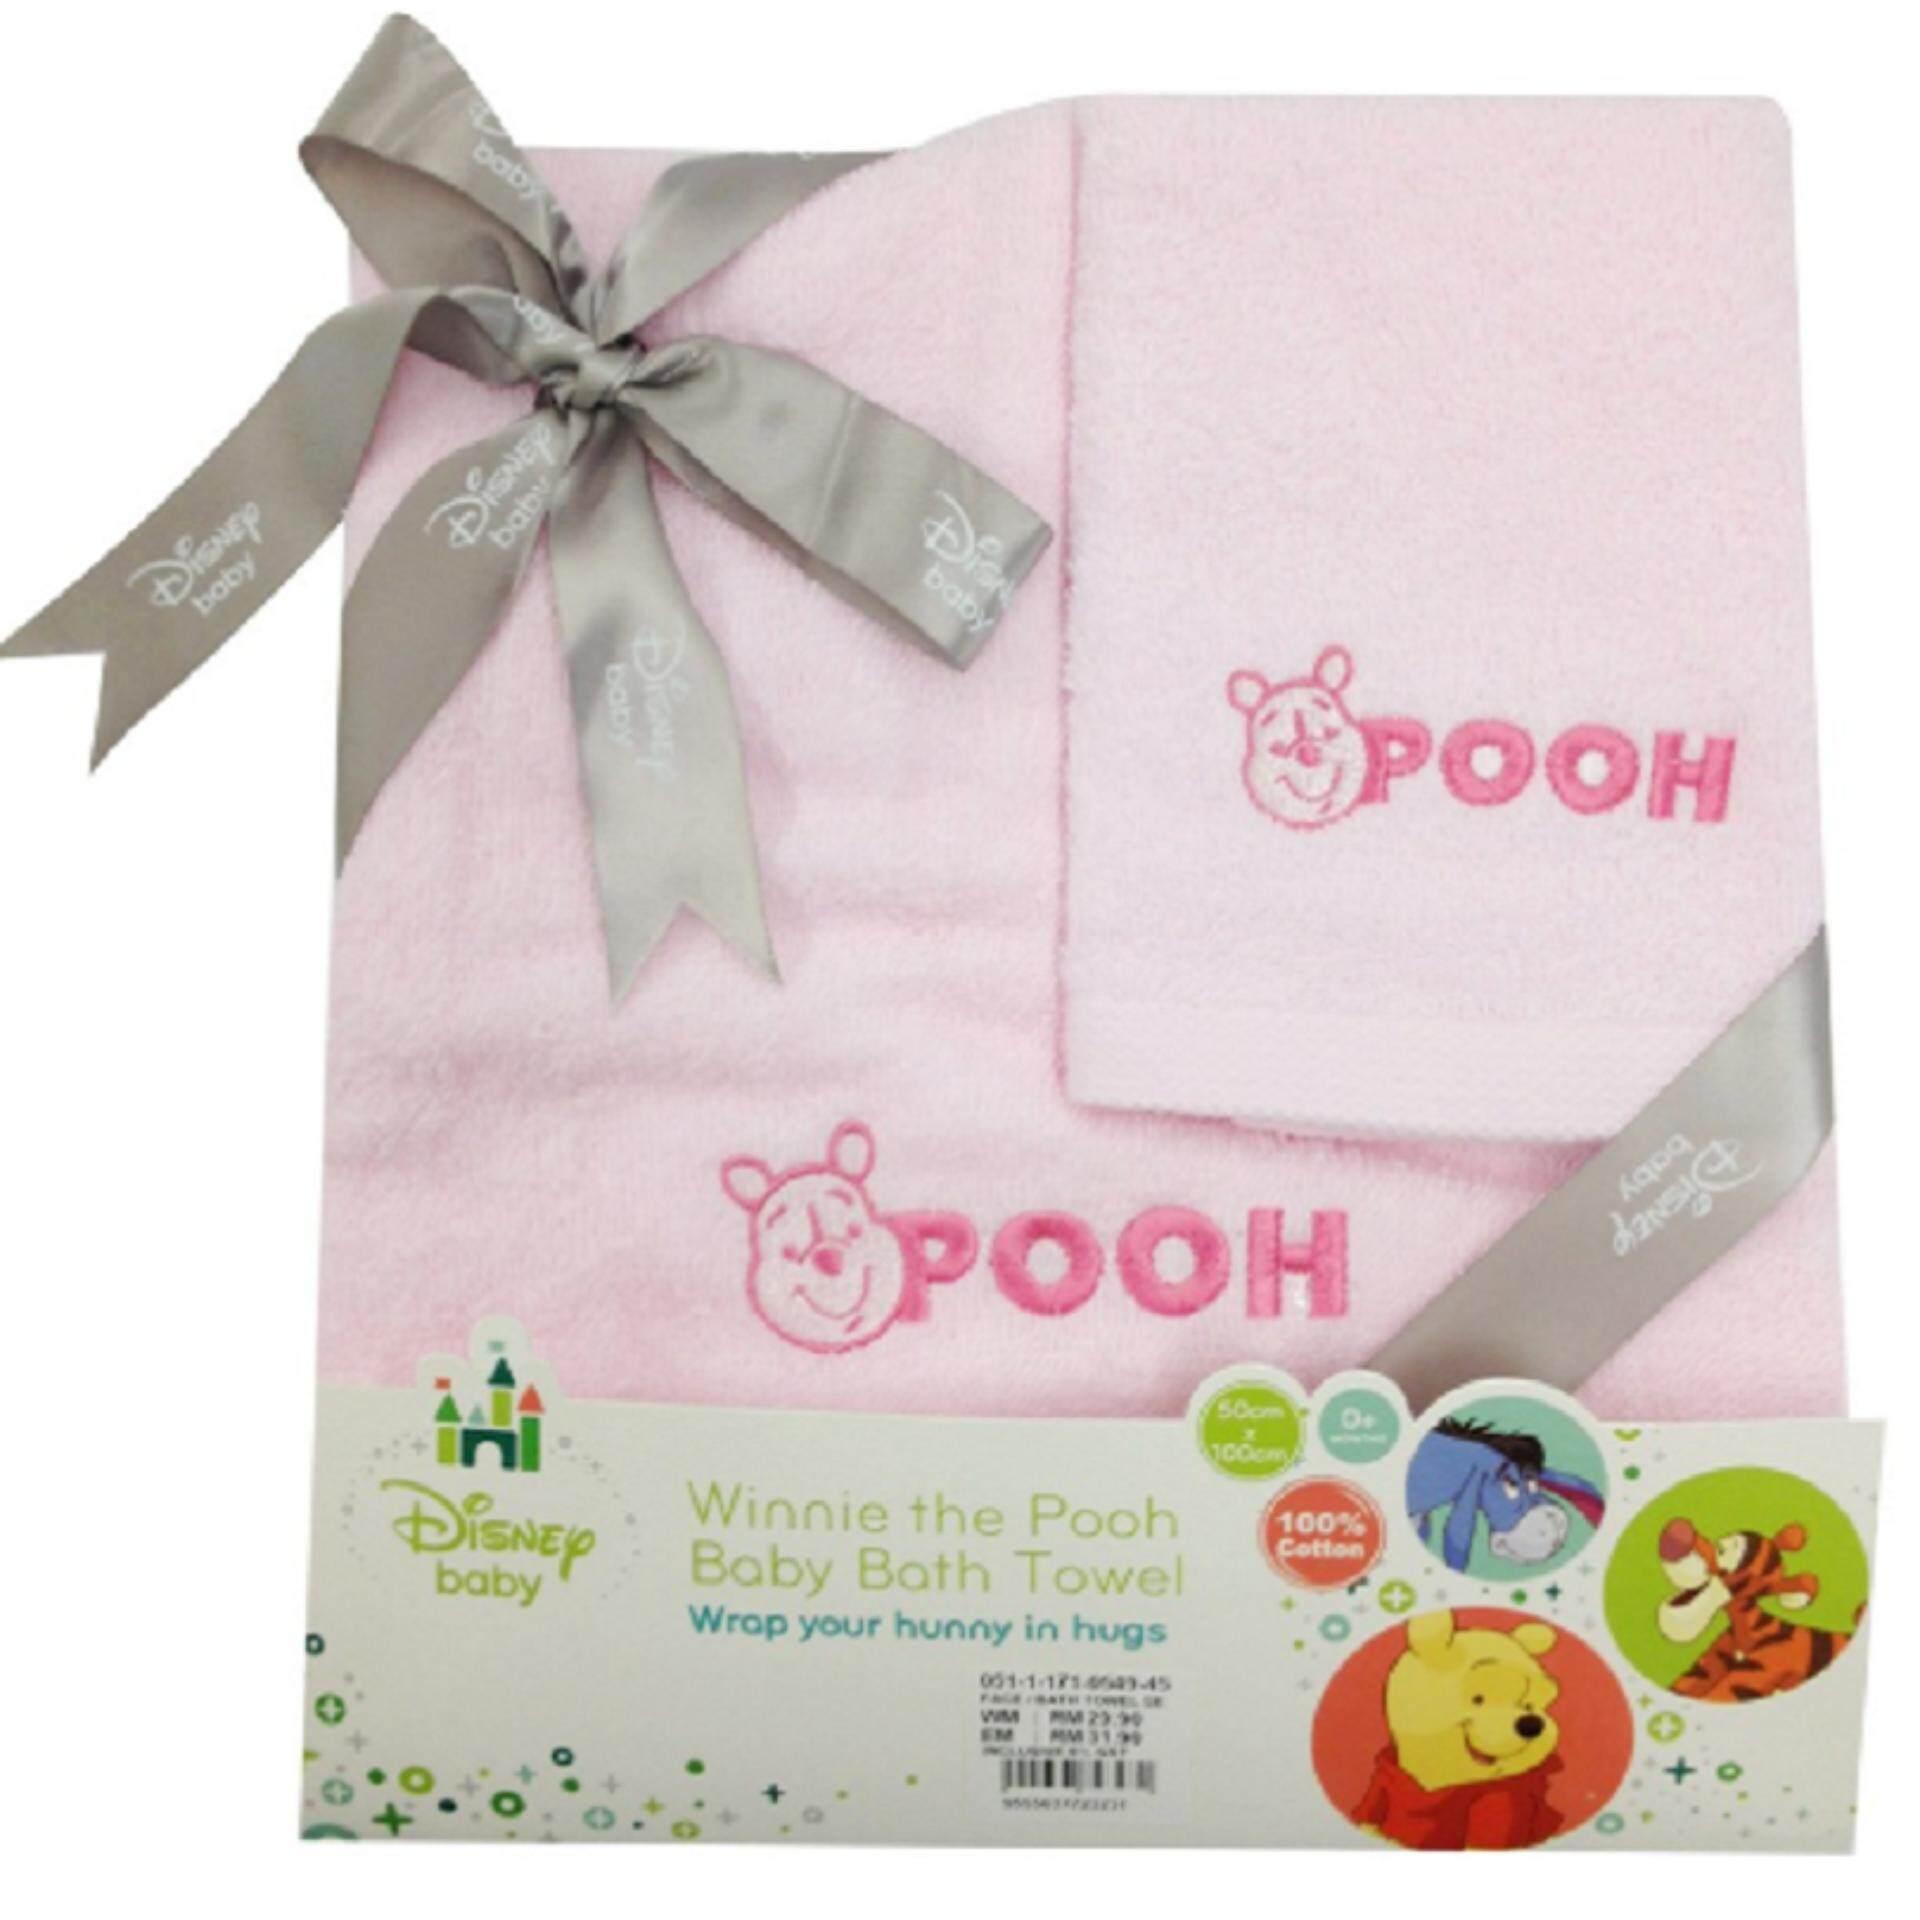 Disney Baby Winnie The Pooh Baby Bath Towel - Pink Colour